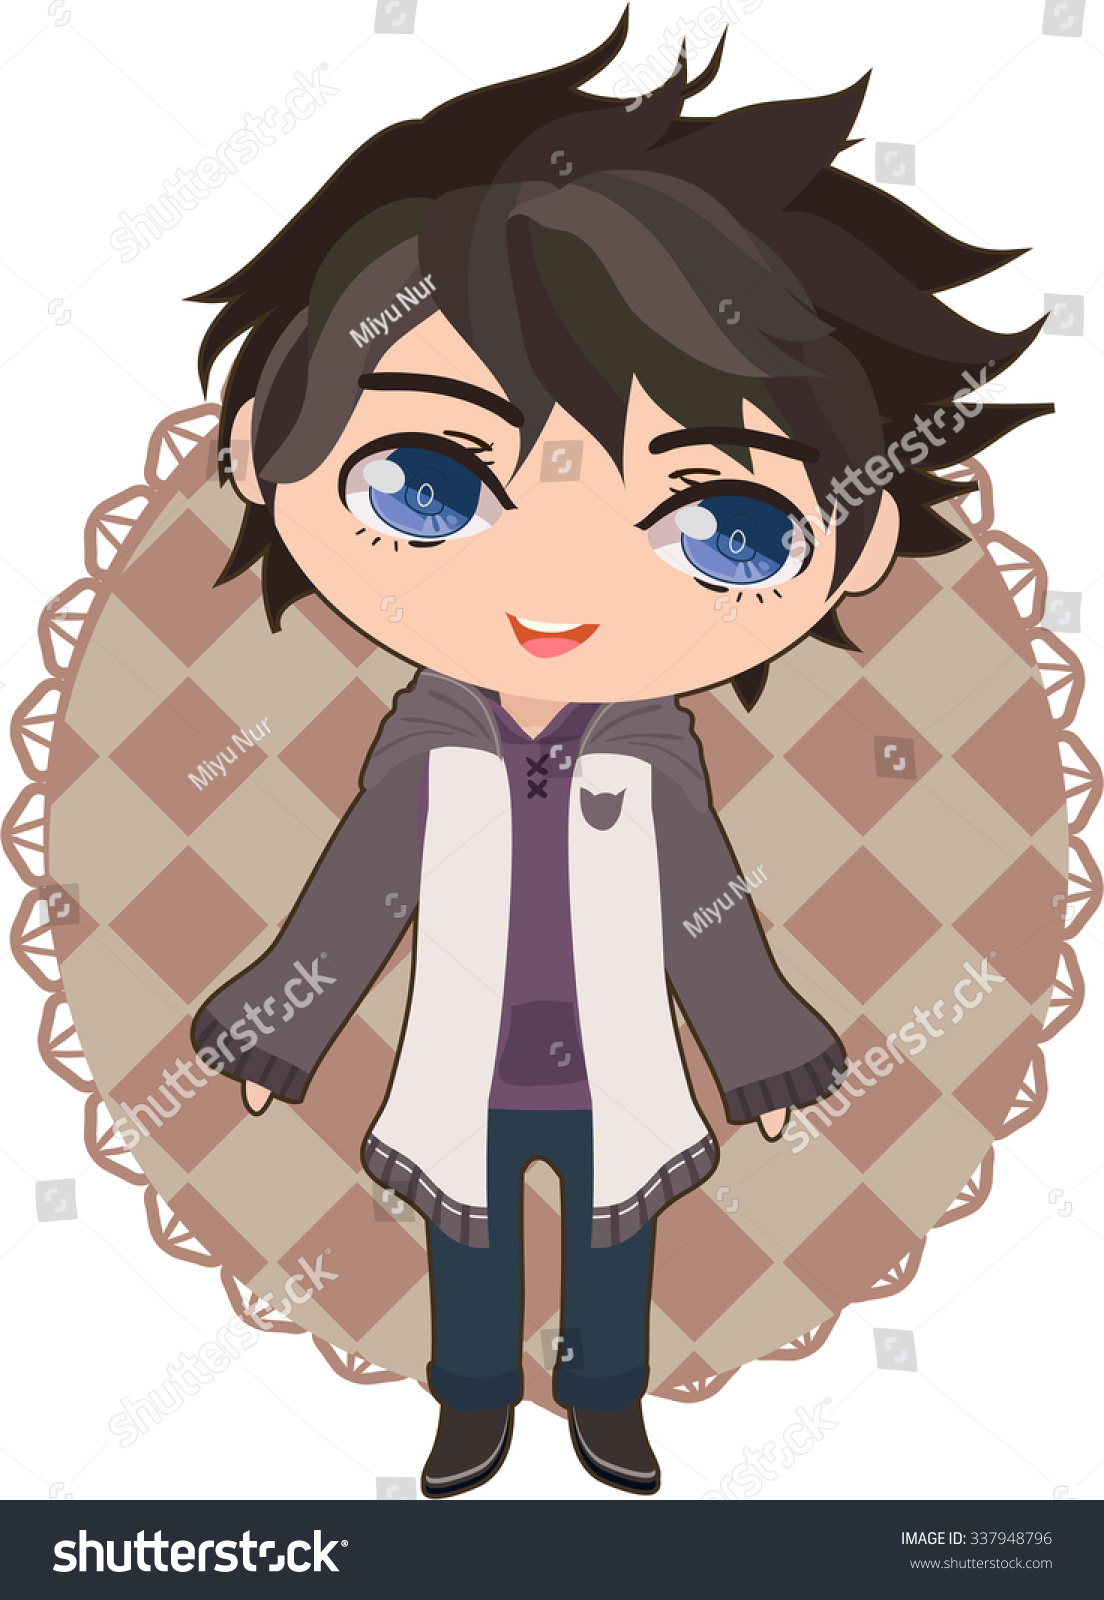 Cute Anime Boy Stock Vector Royalty Free 337948796